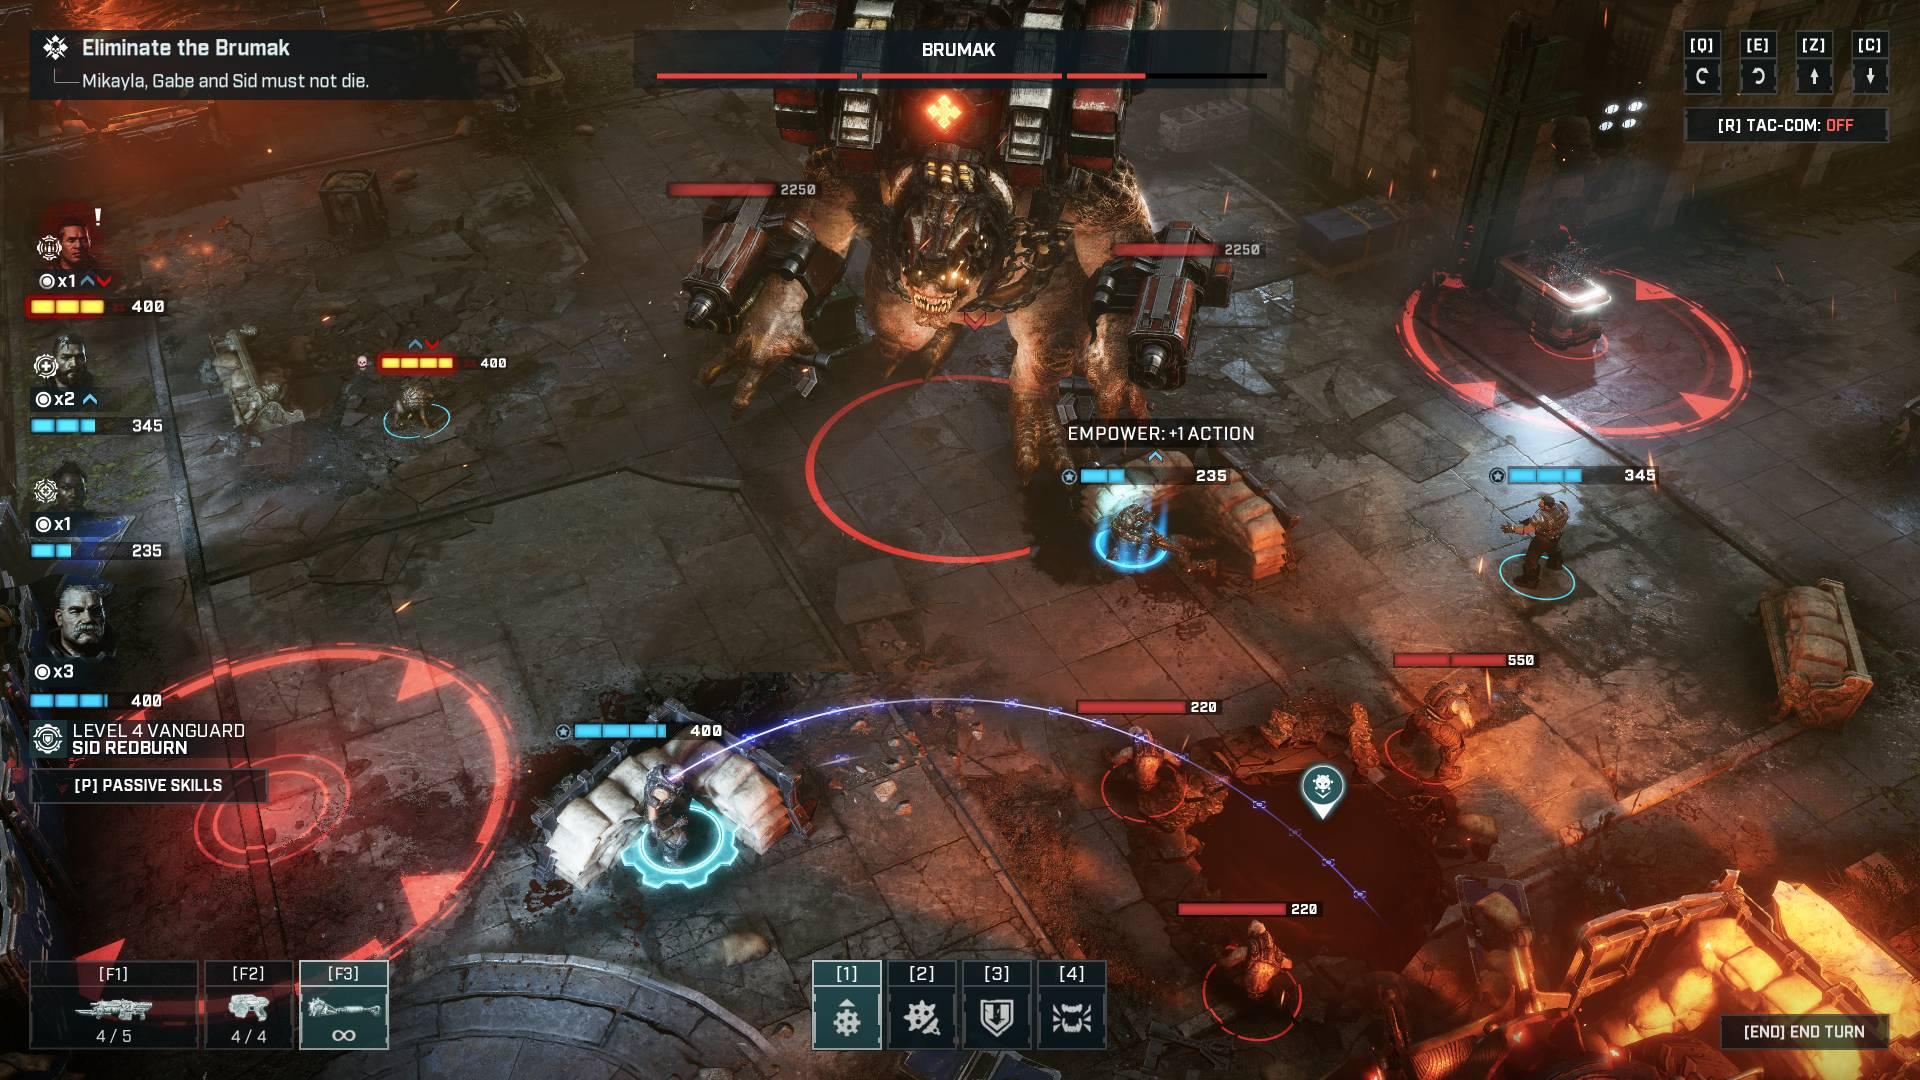 gears tactics img 1 - Recensione Gears Tactics